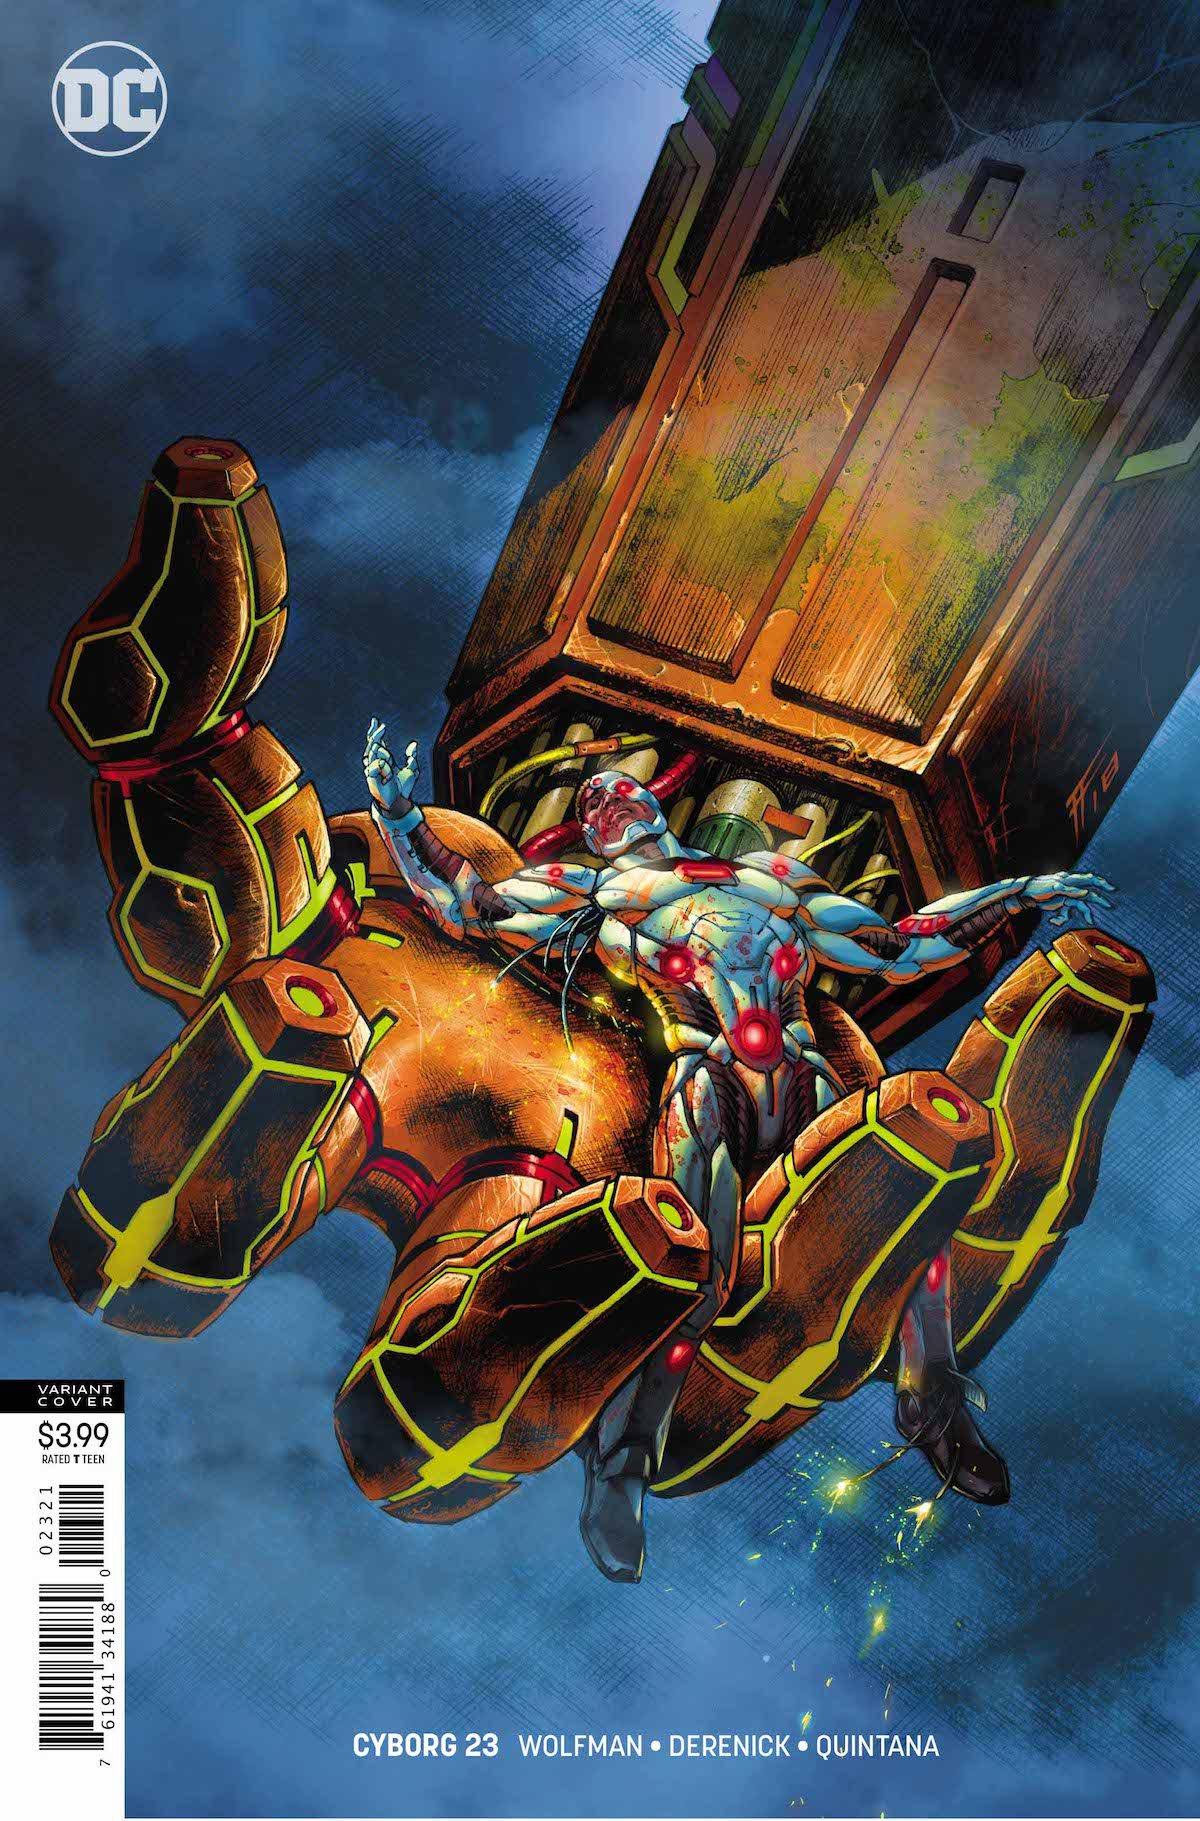 Cyborg #23 variant cover